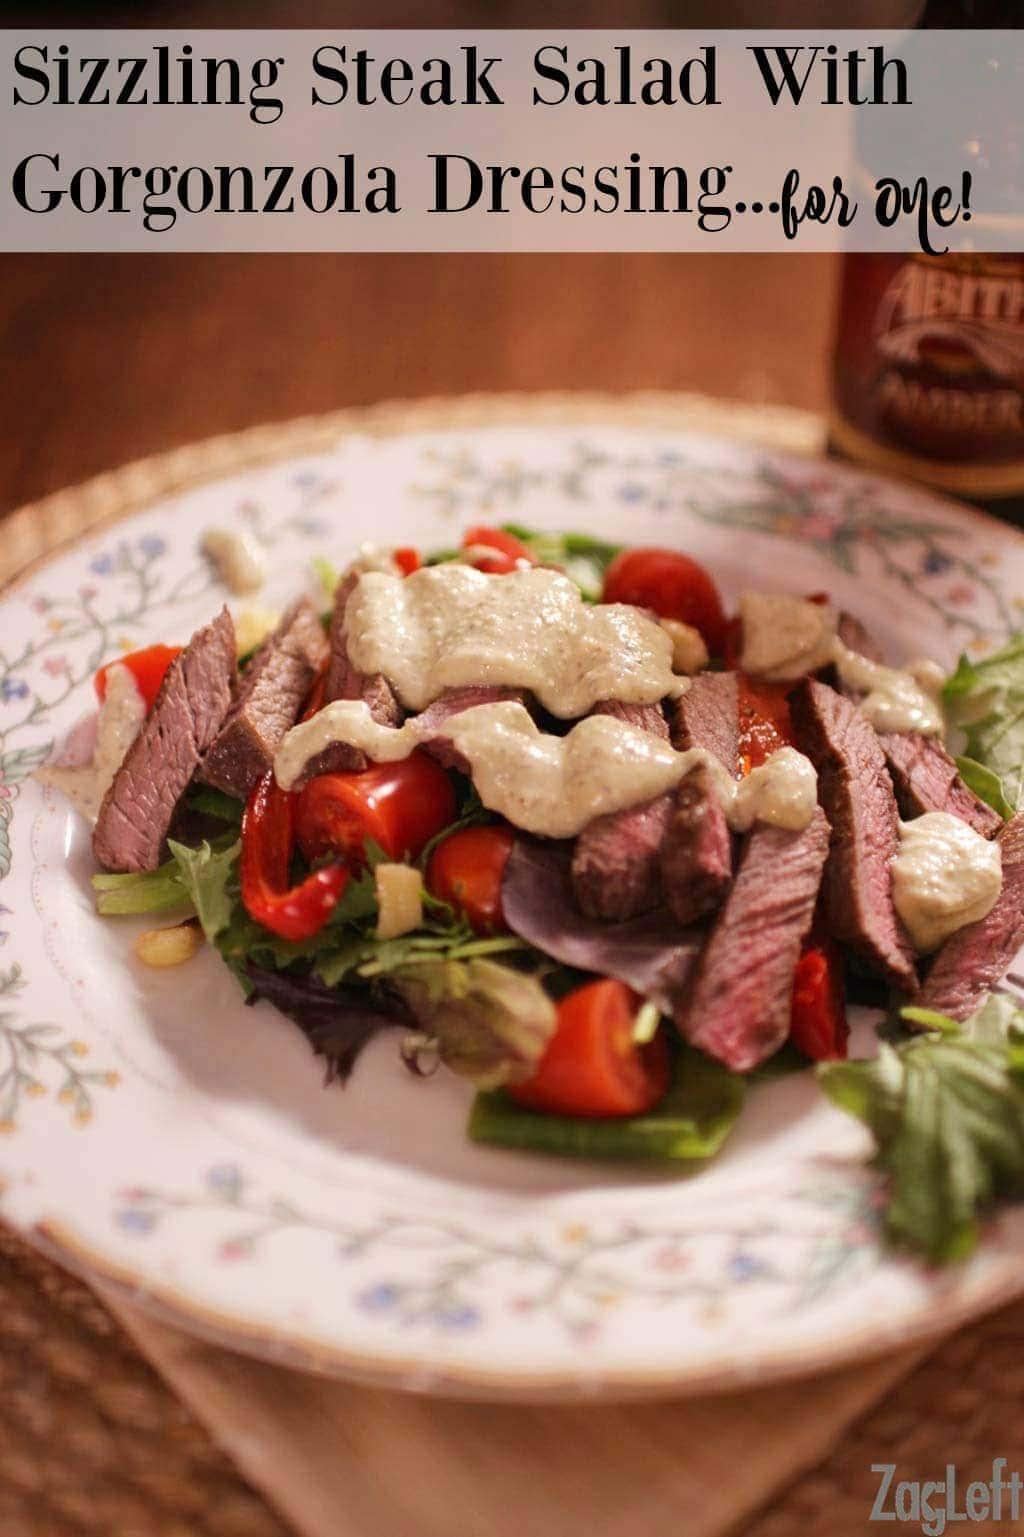 w1-sizzling-steak-salad-gorgonzola-dressing-zagleft-1